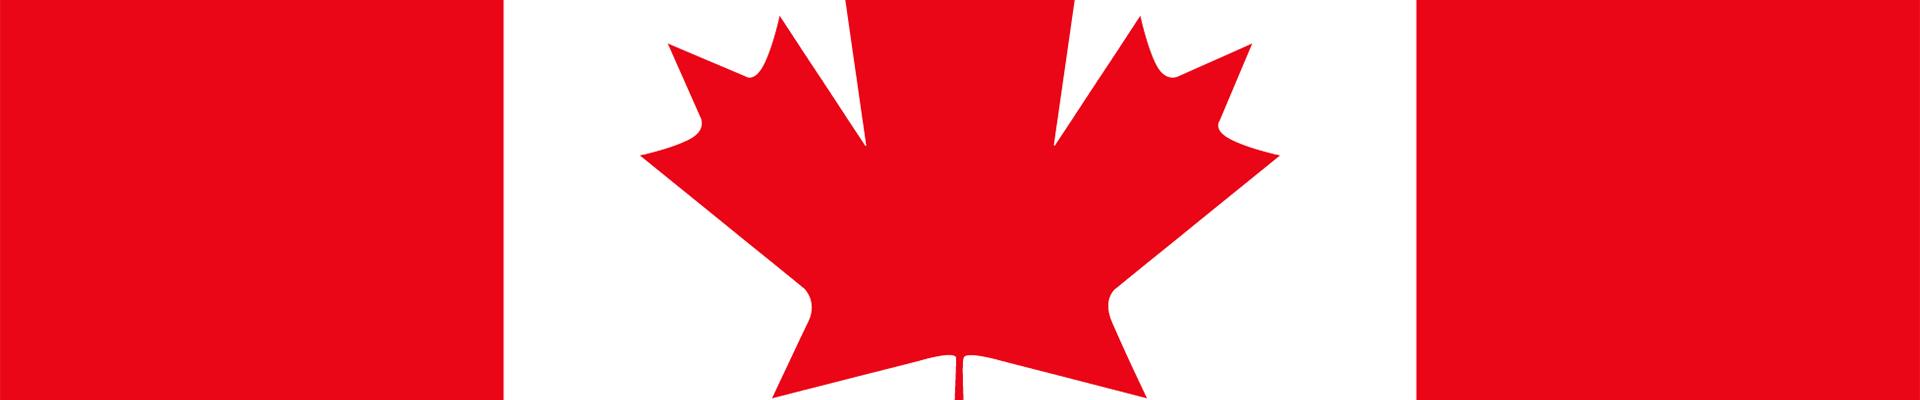 how to watch Netherlands vs Czech Republic live stream — Canada flag